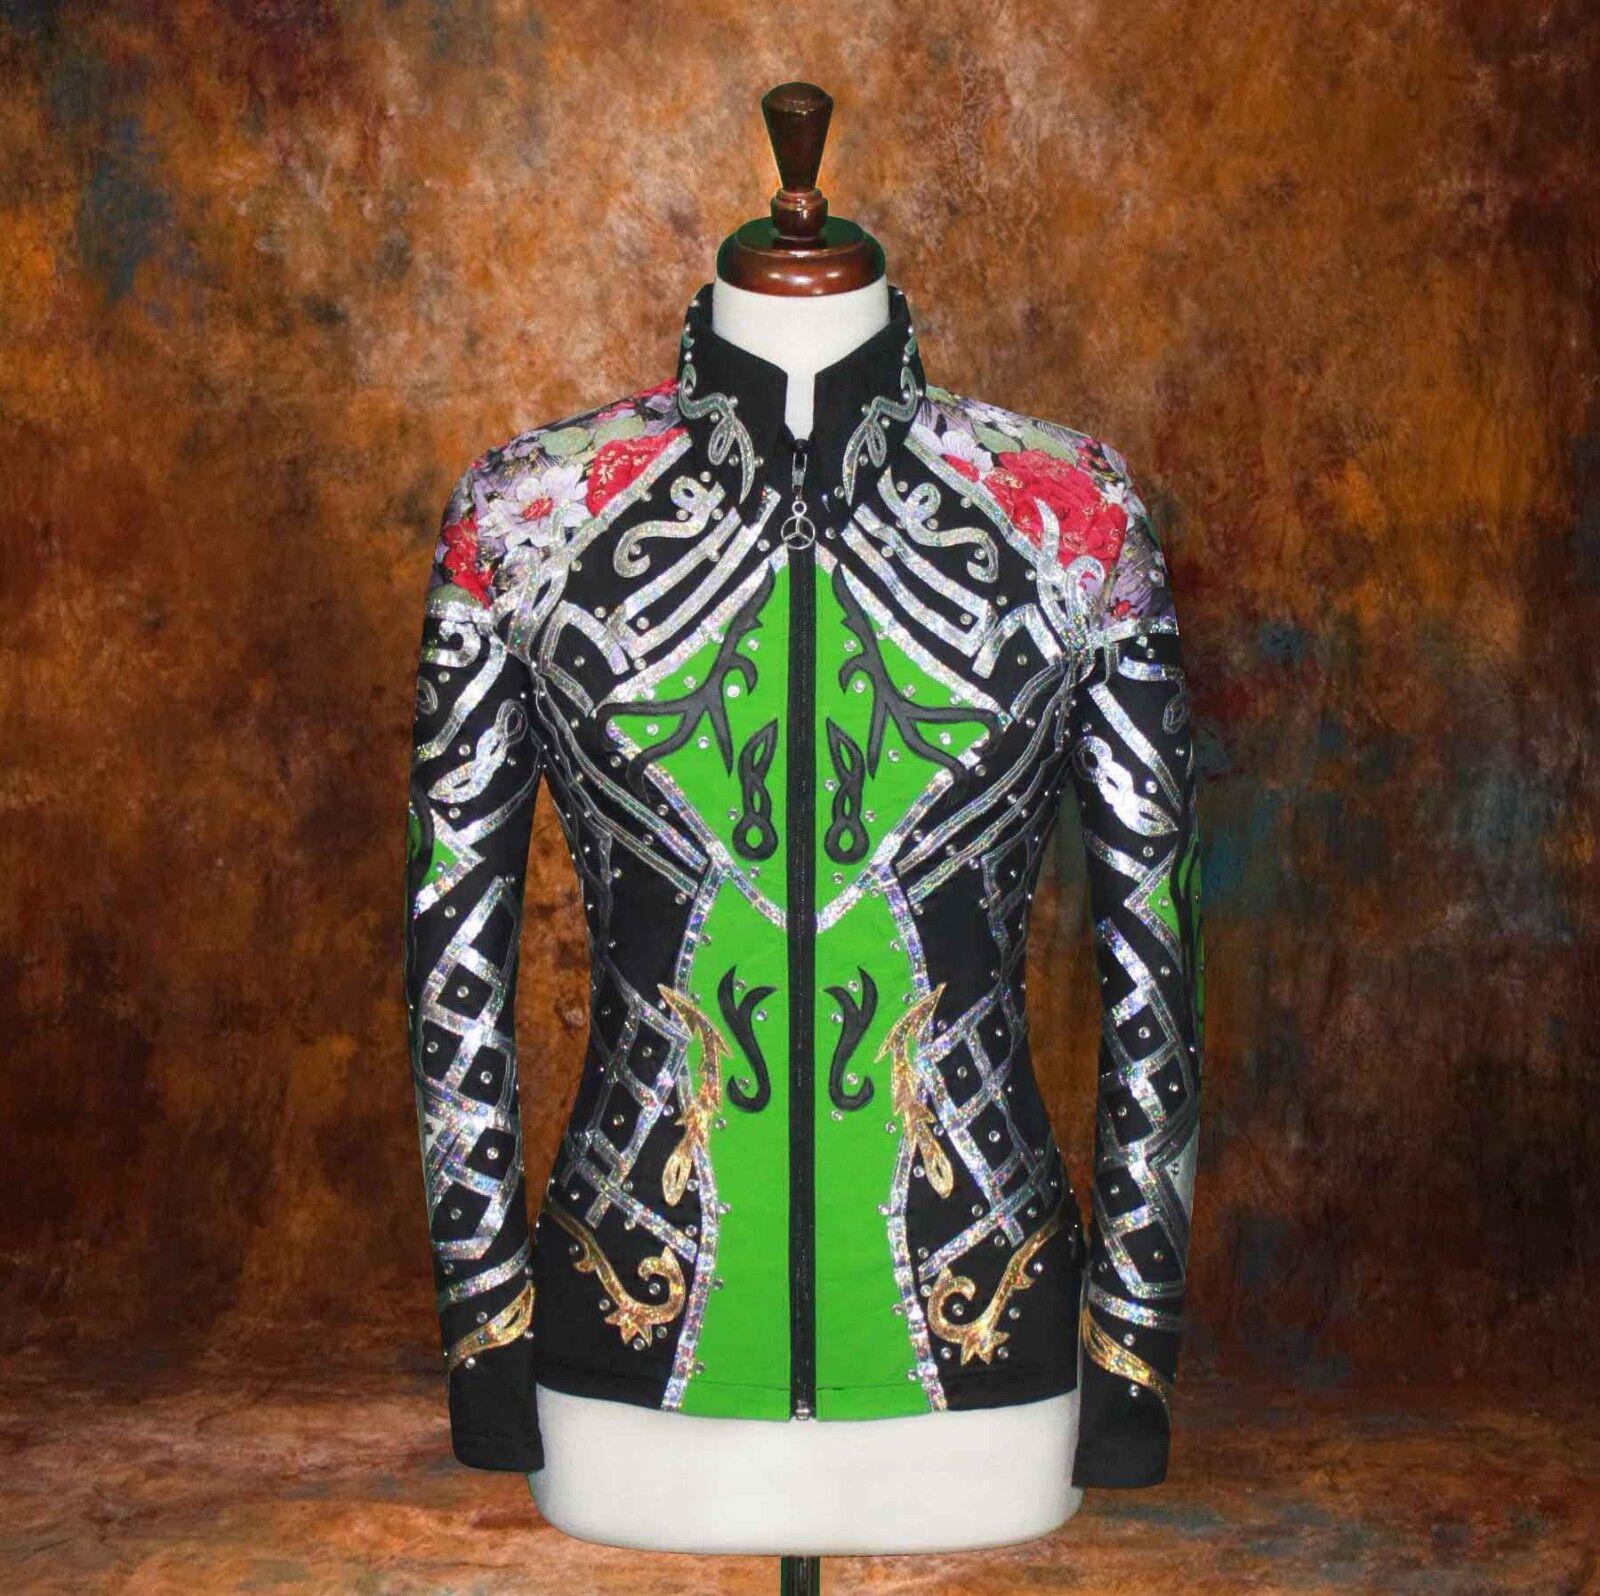 Xgree  Western mostrareuomoship Pleasure Horseuomoship mostrare Jacket Shirt Shirt Shirt Rodeo regina efd